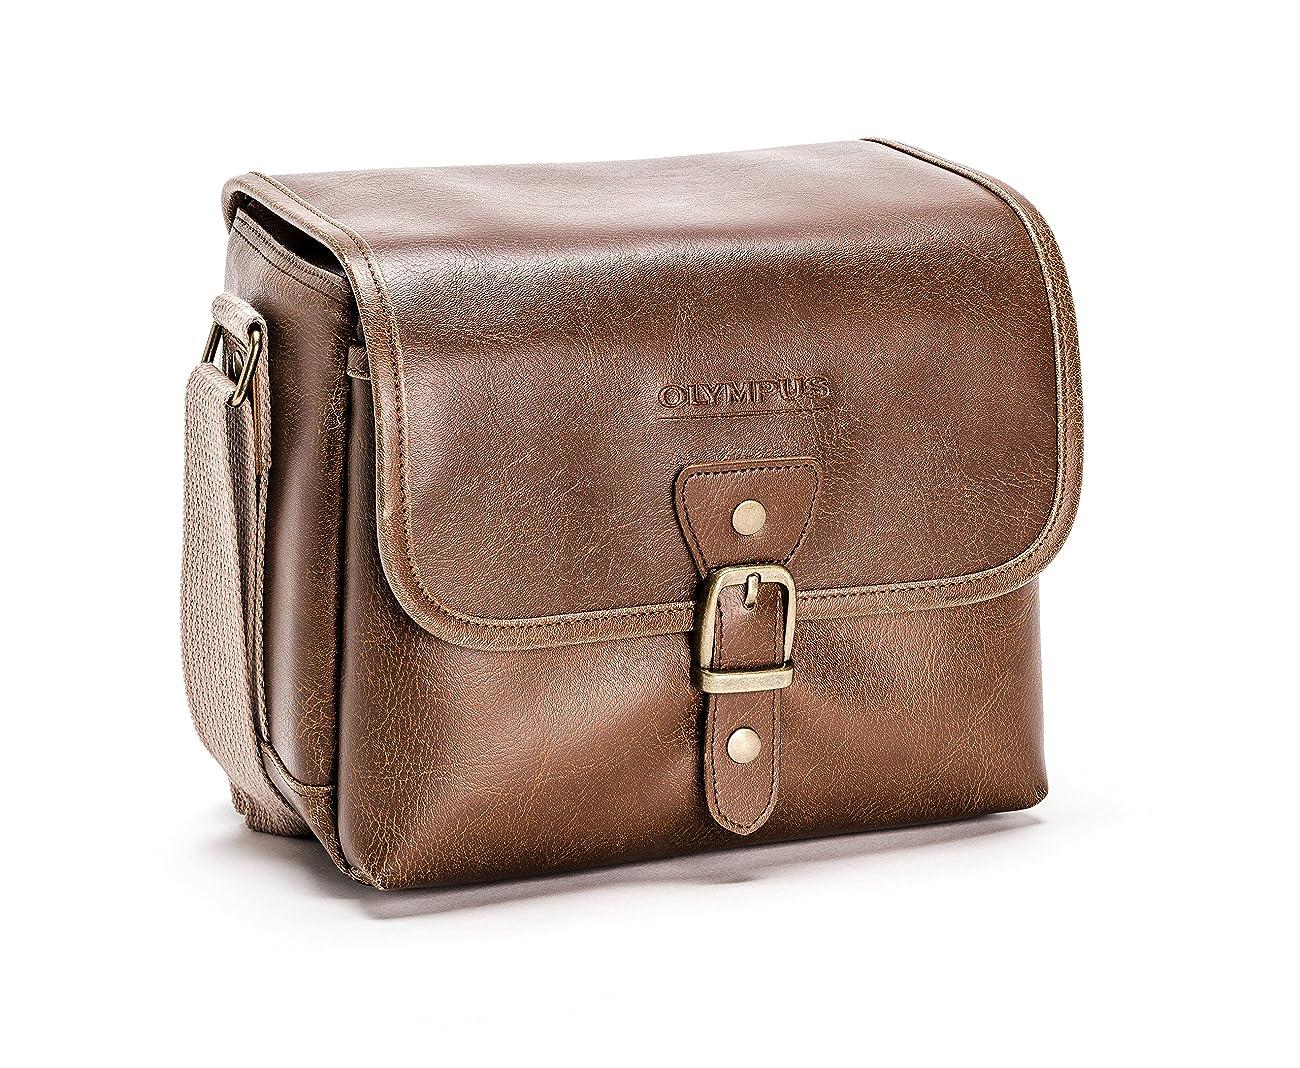 Olympus Tracker Classic Design Vintage Camera Bag (Brown) 0